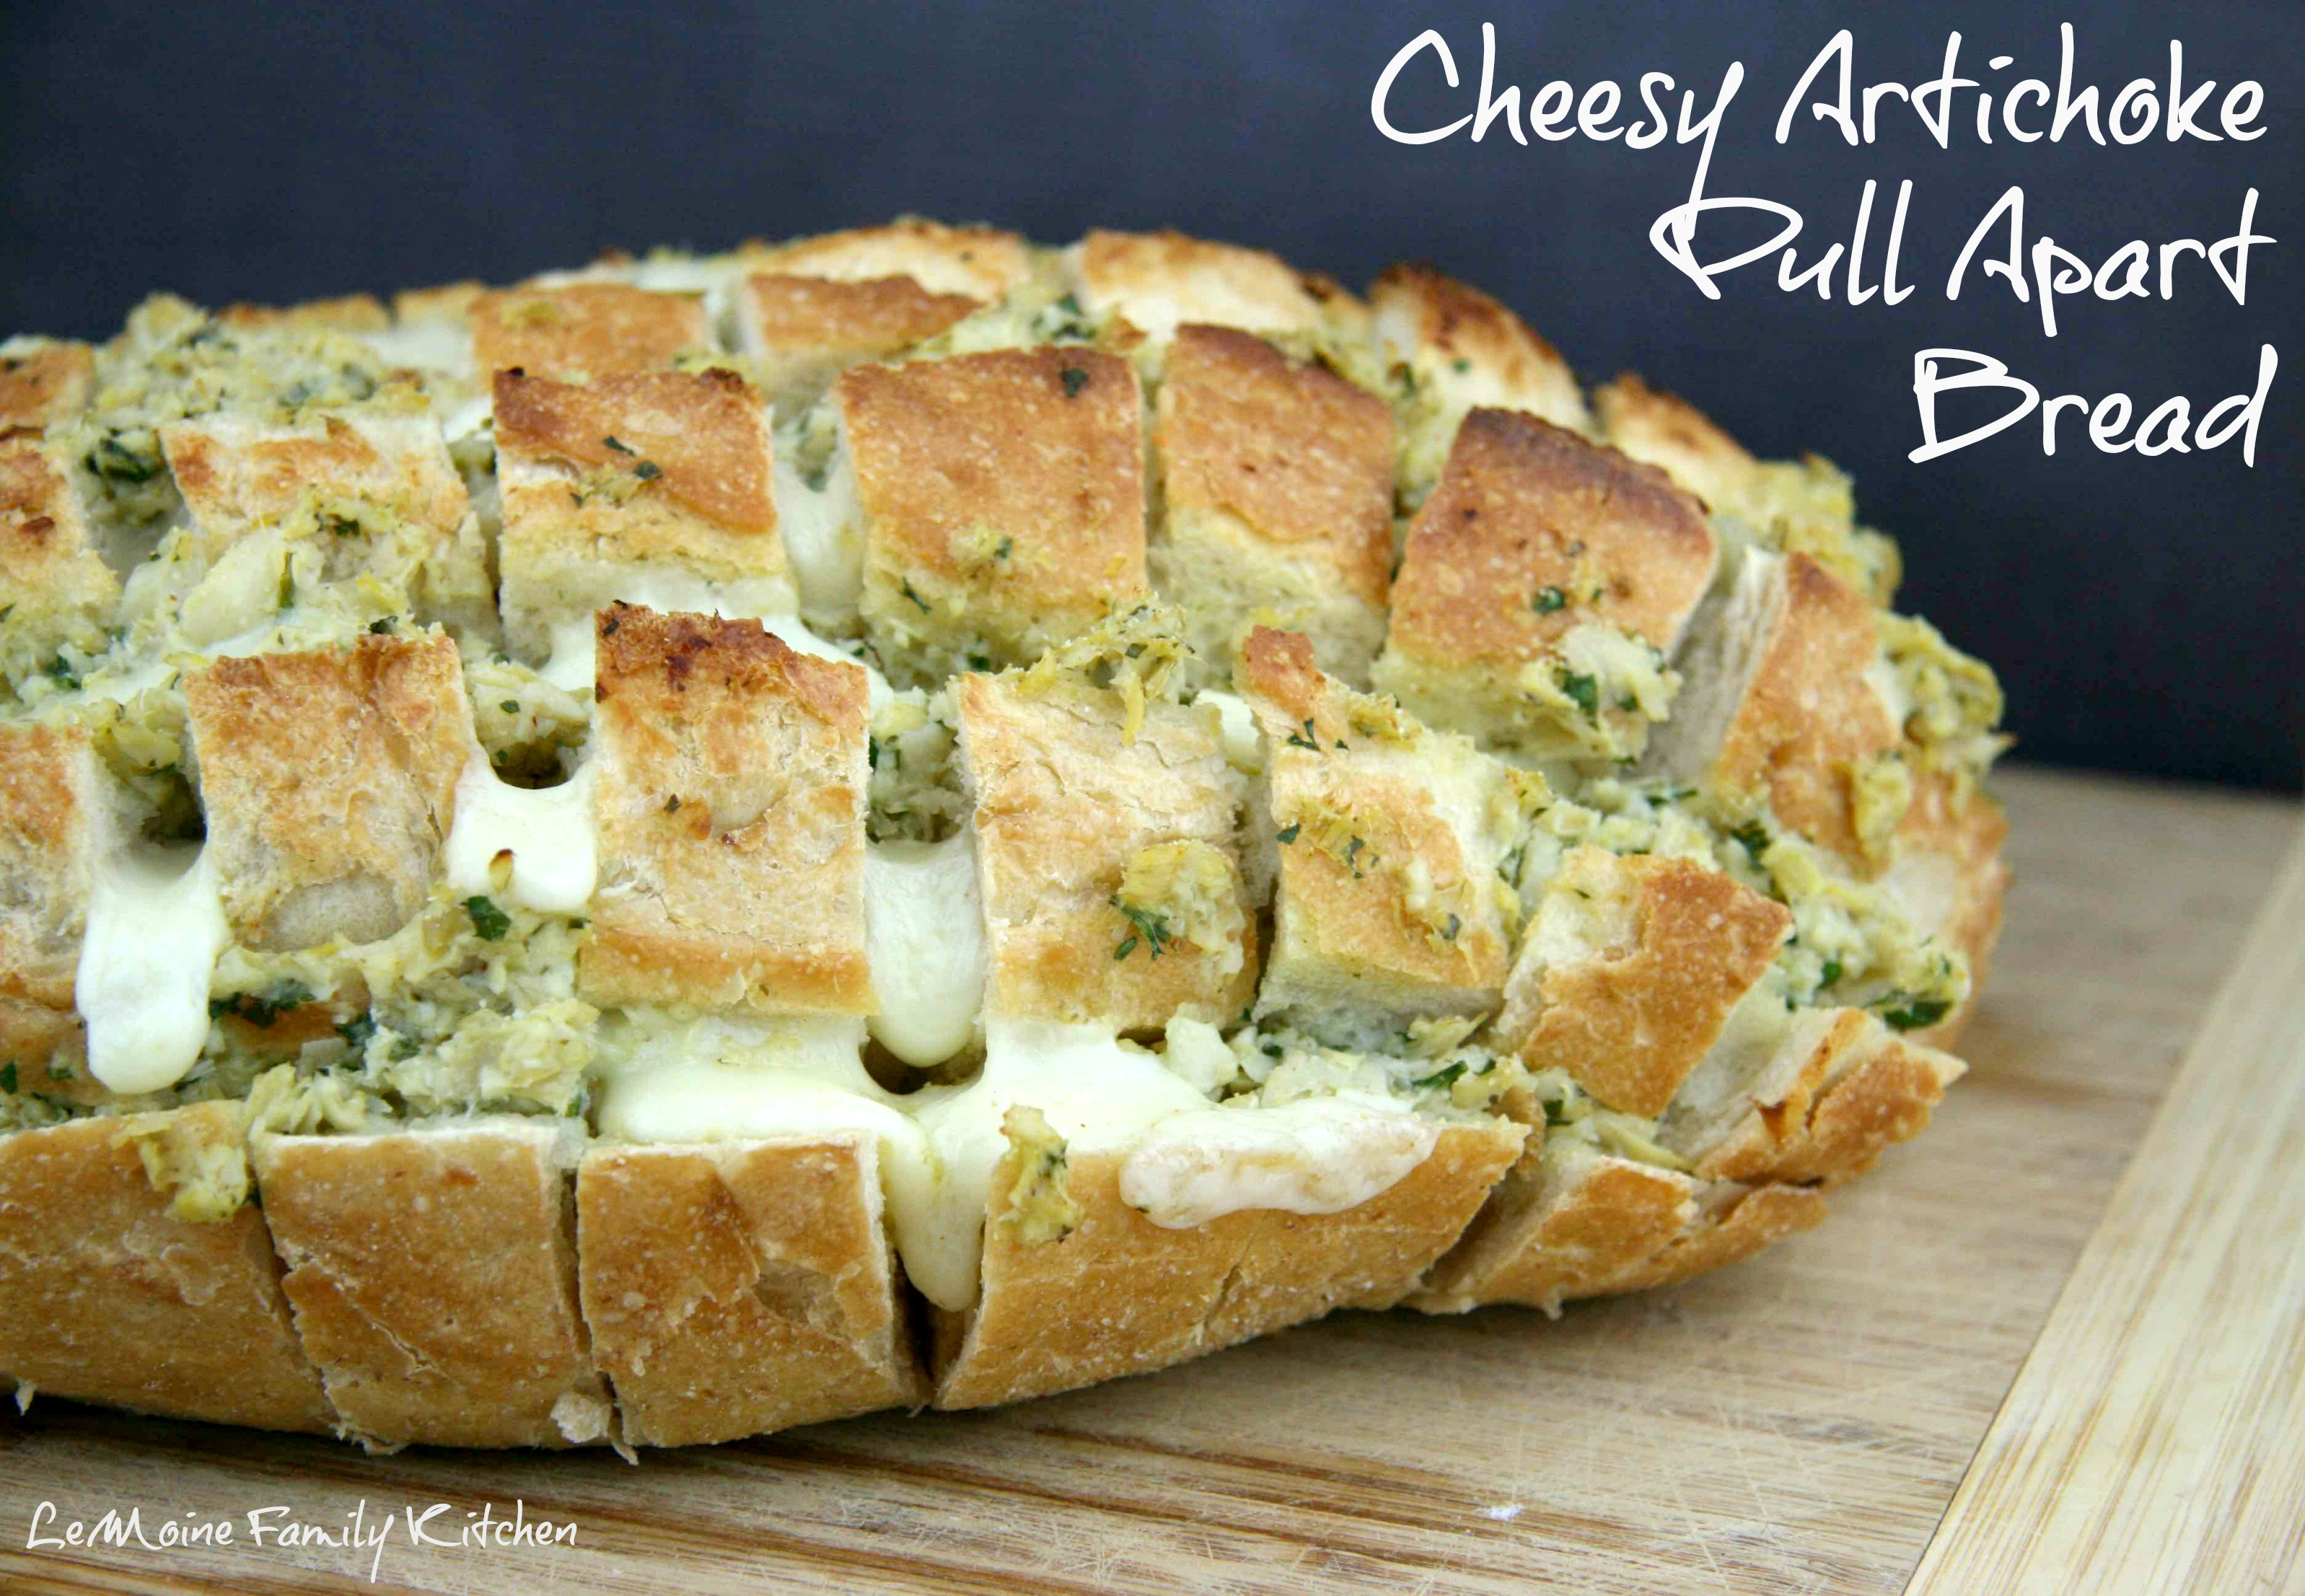 Cheesy Artichoke Pull Apart Bread | LeMoine Family Kitchen #pullapart #fontina #artichokehearts #appetizer